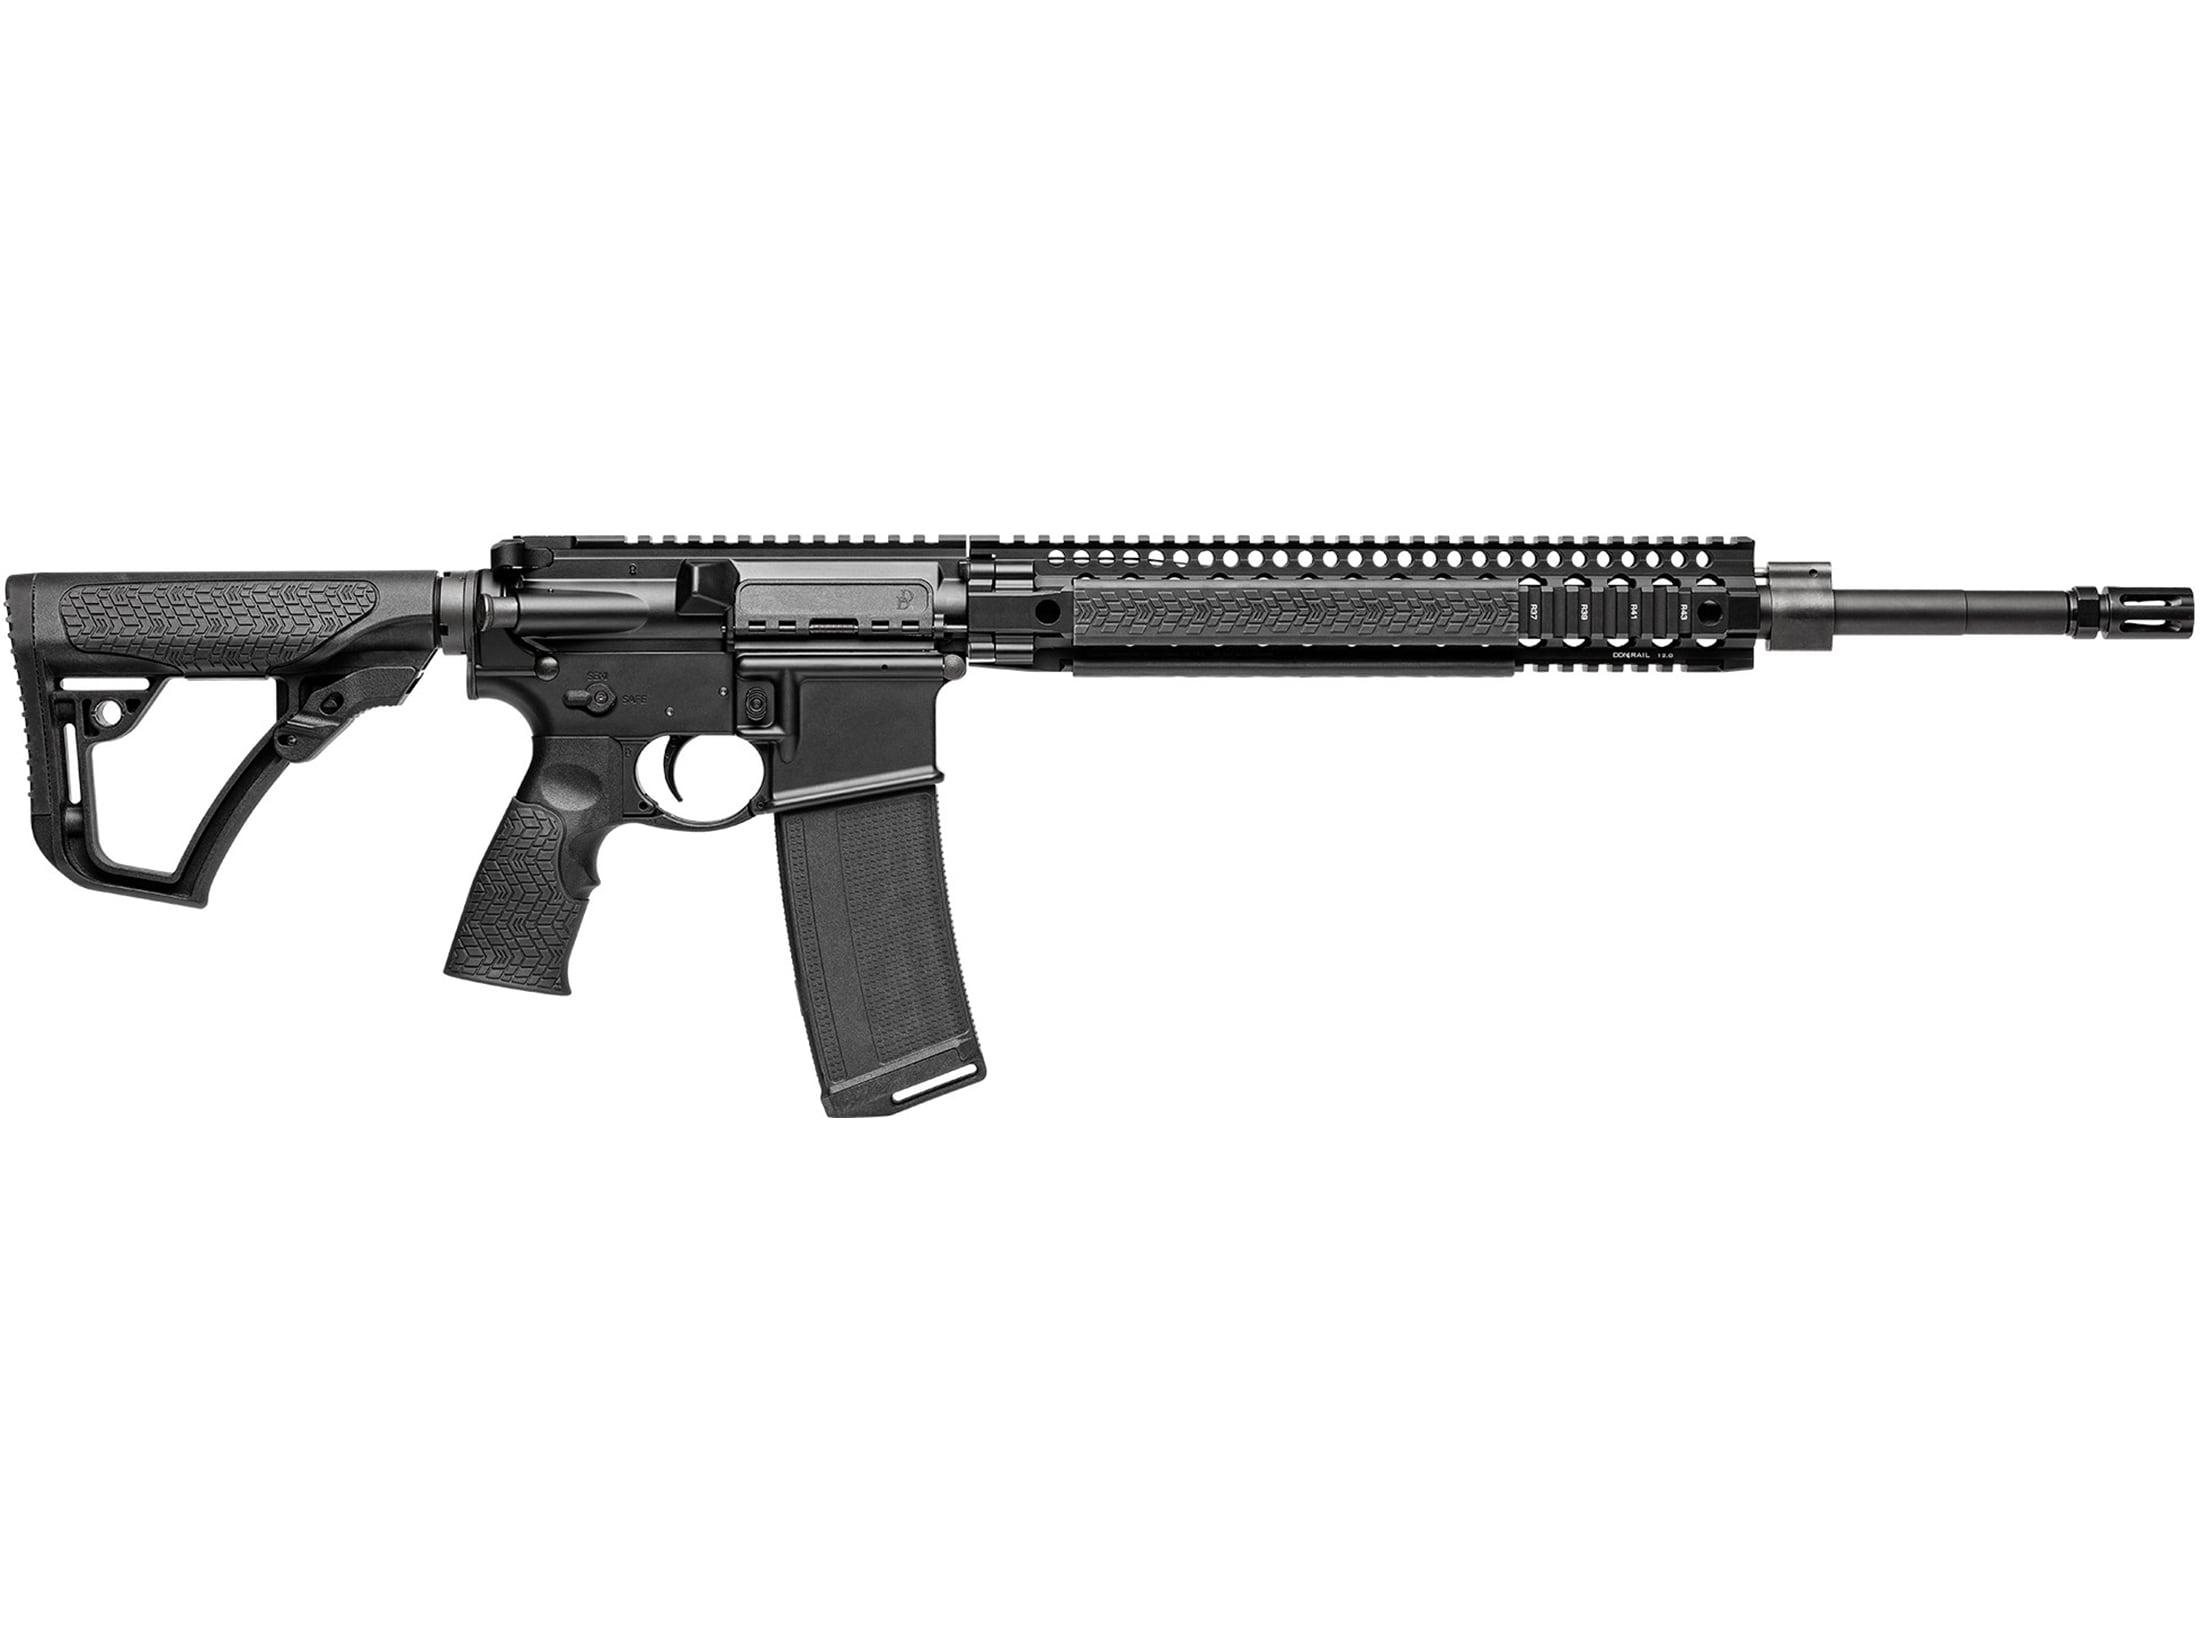 "Image of Daniel Defense MK12 Carbine 5.56x45mm NATO 18"" Barrel 20-Round Polymer"